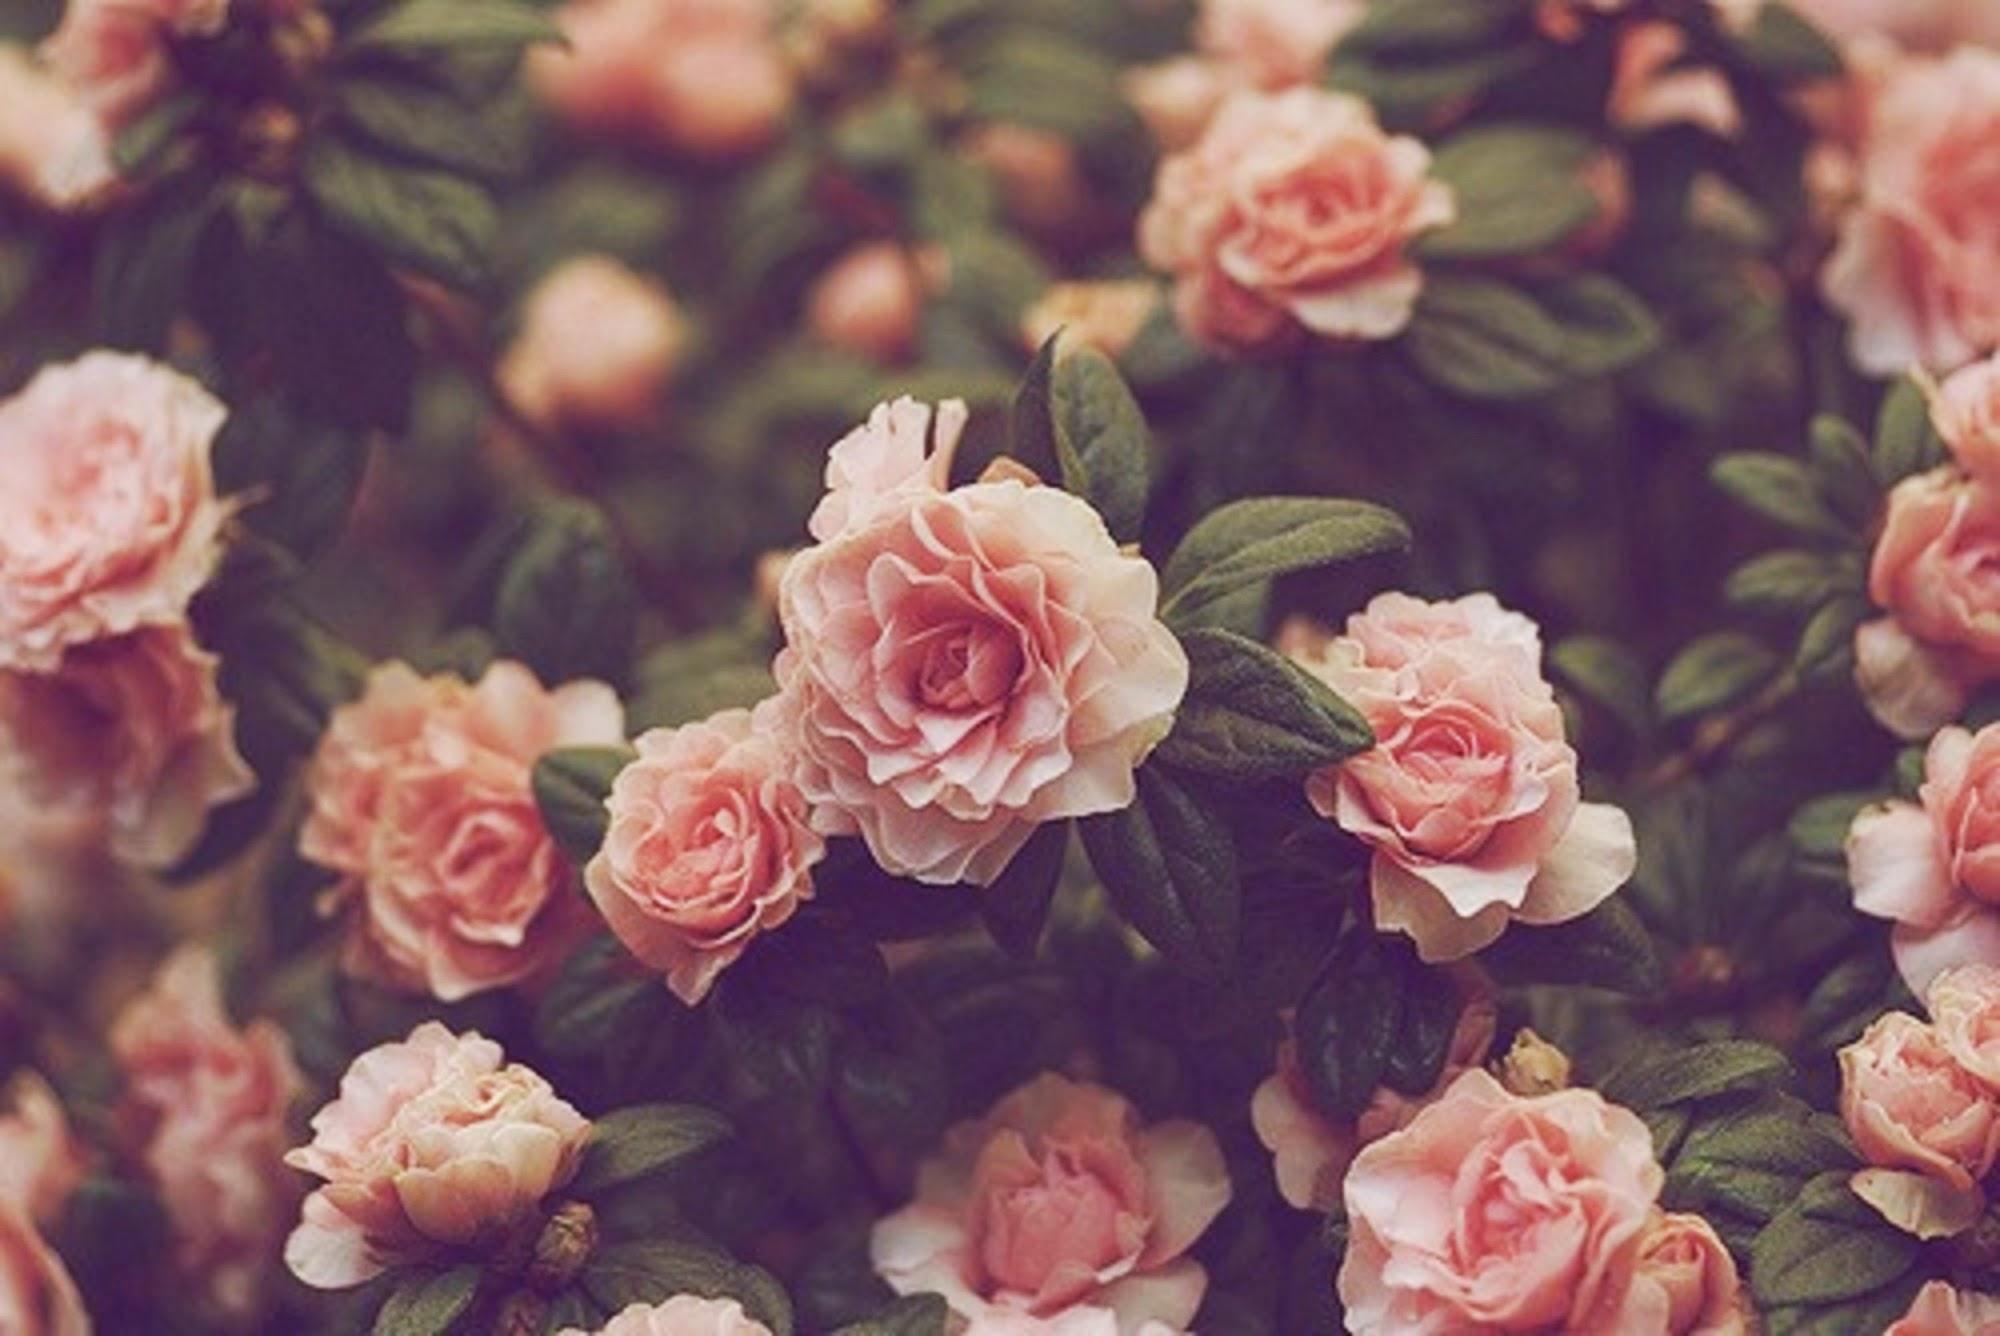 tumblr floral wallpaper - sf wallpaper